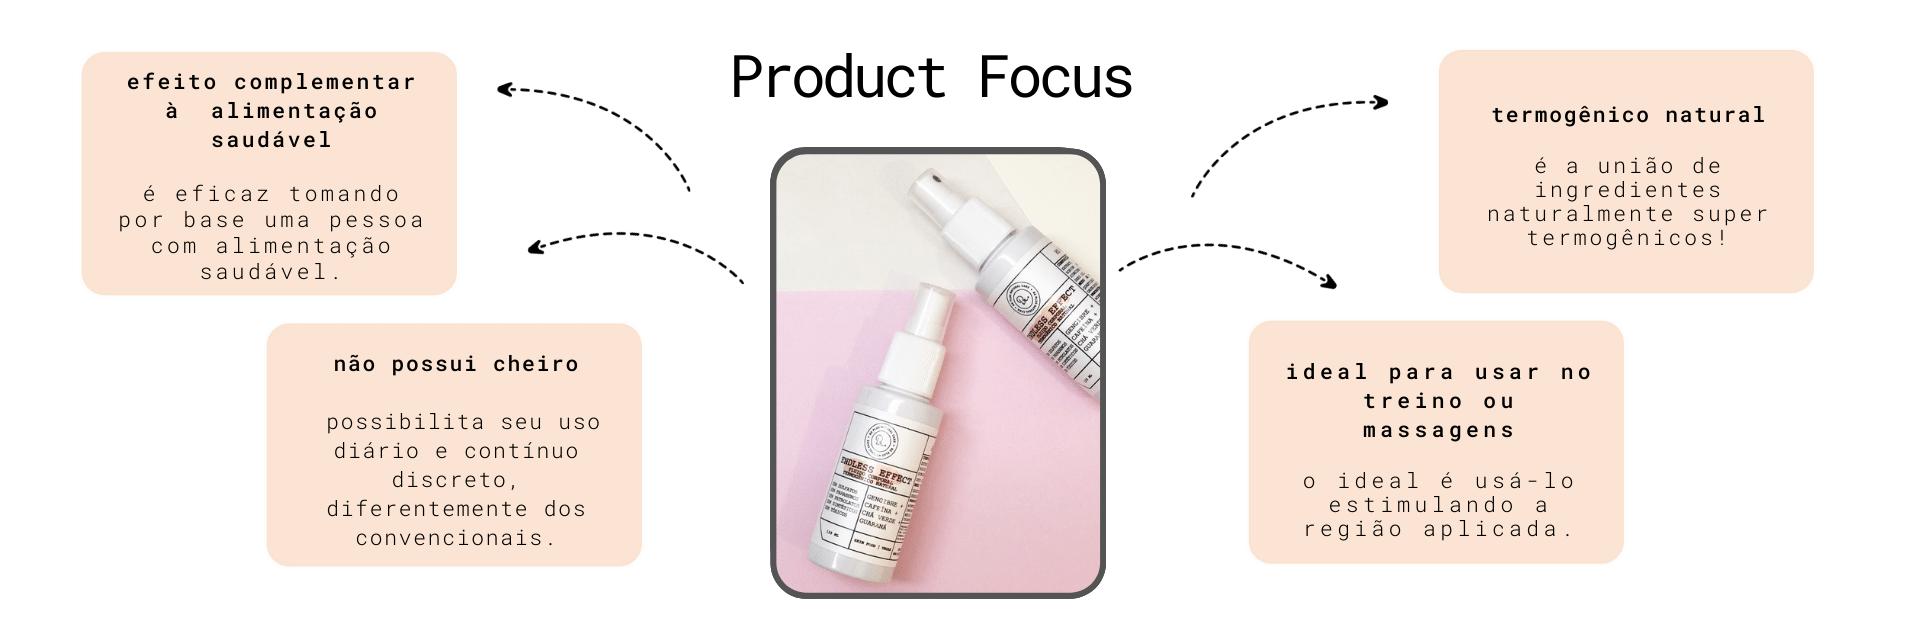 [Banner produto] termogênico